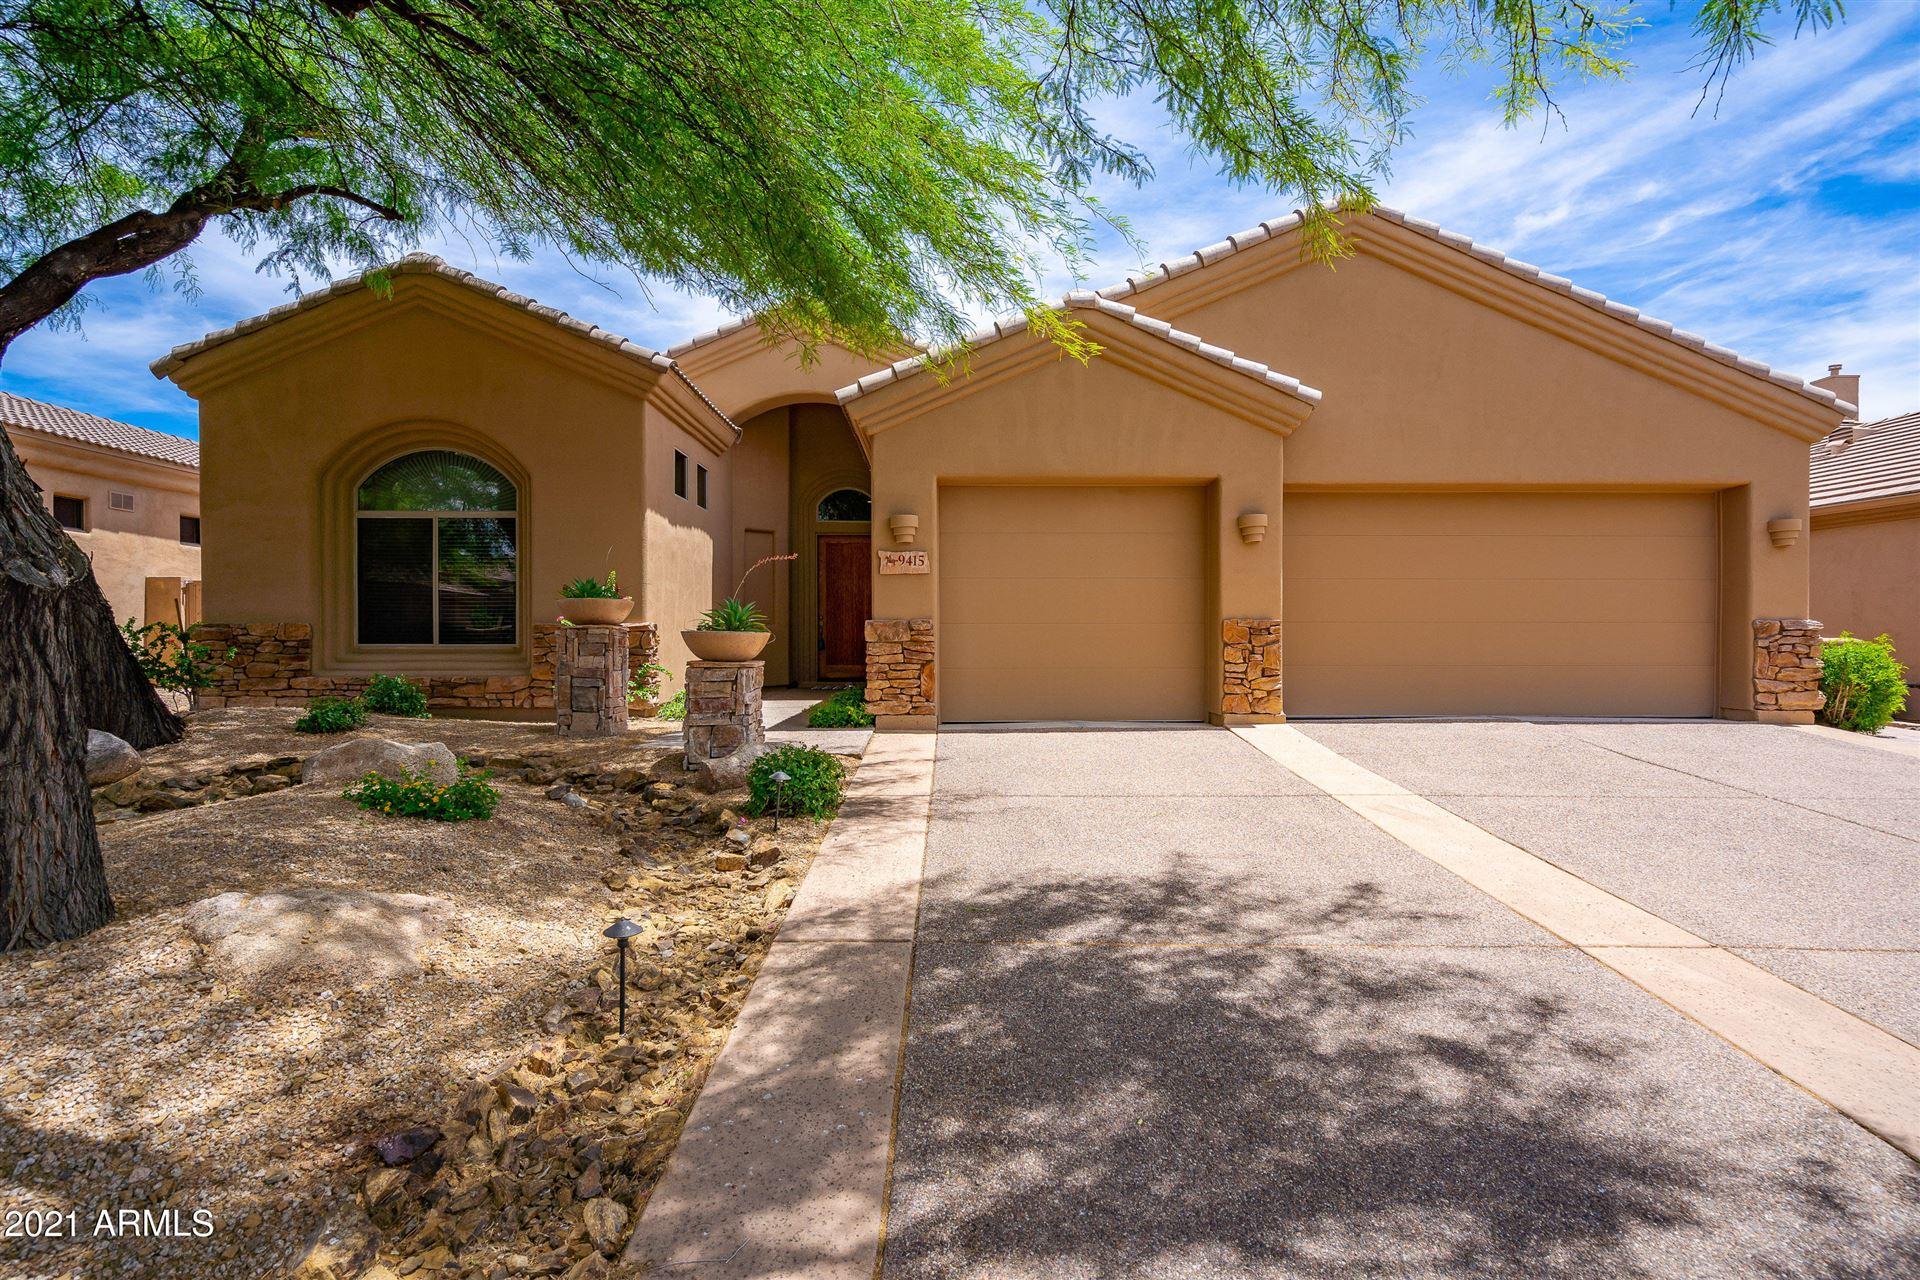 9415 E CAVALRY Drive, Scottsdale, AZ 85262 - MLS#: 6217644